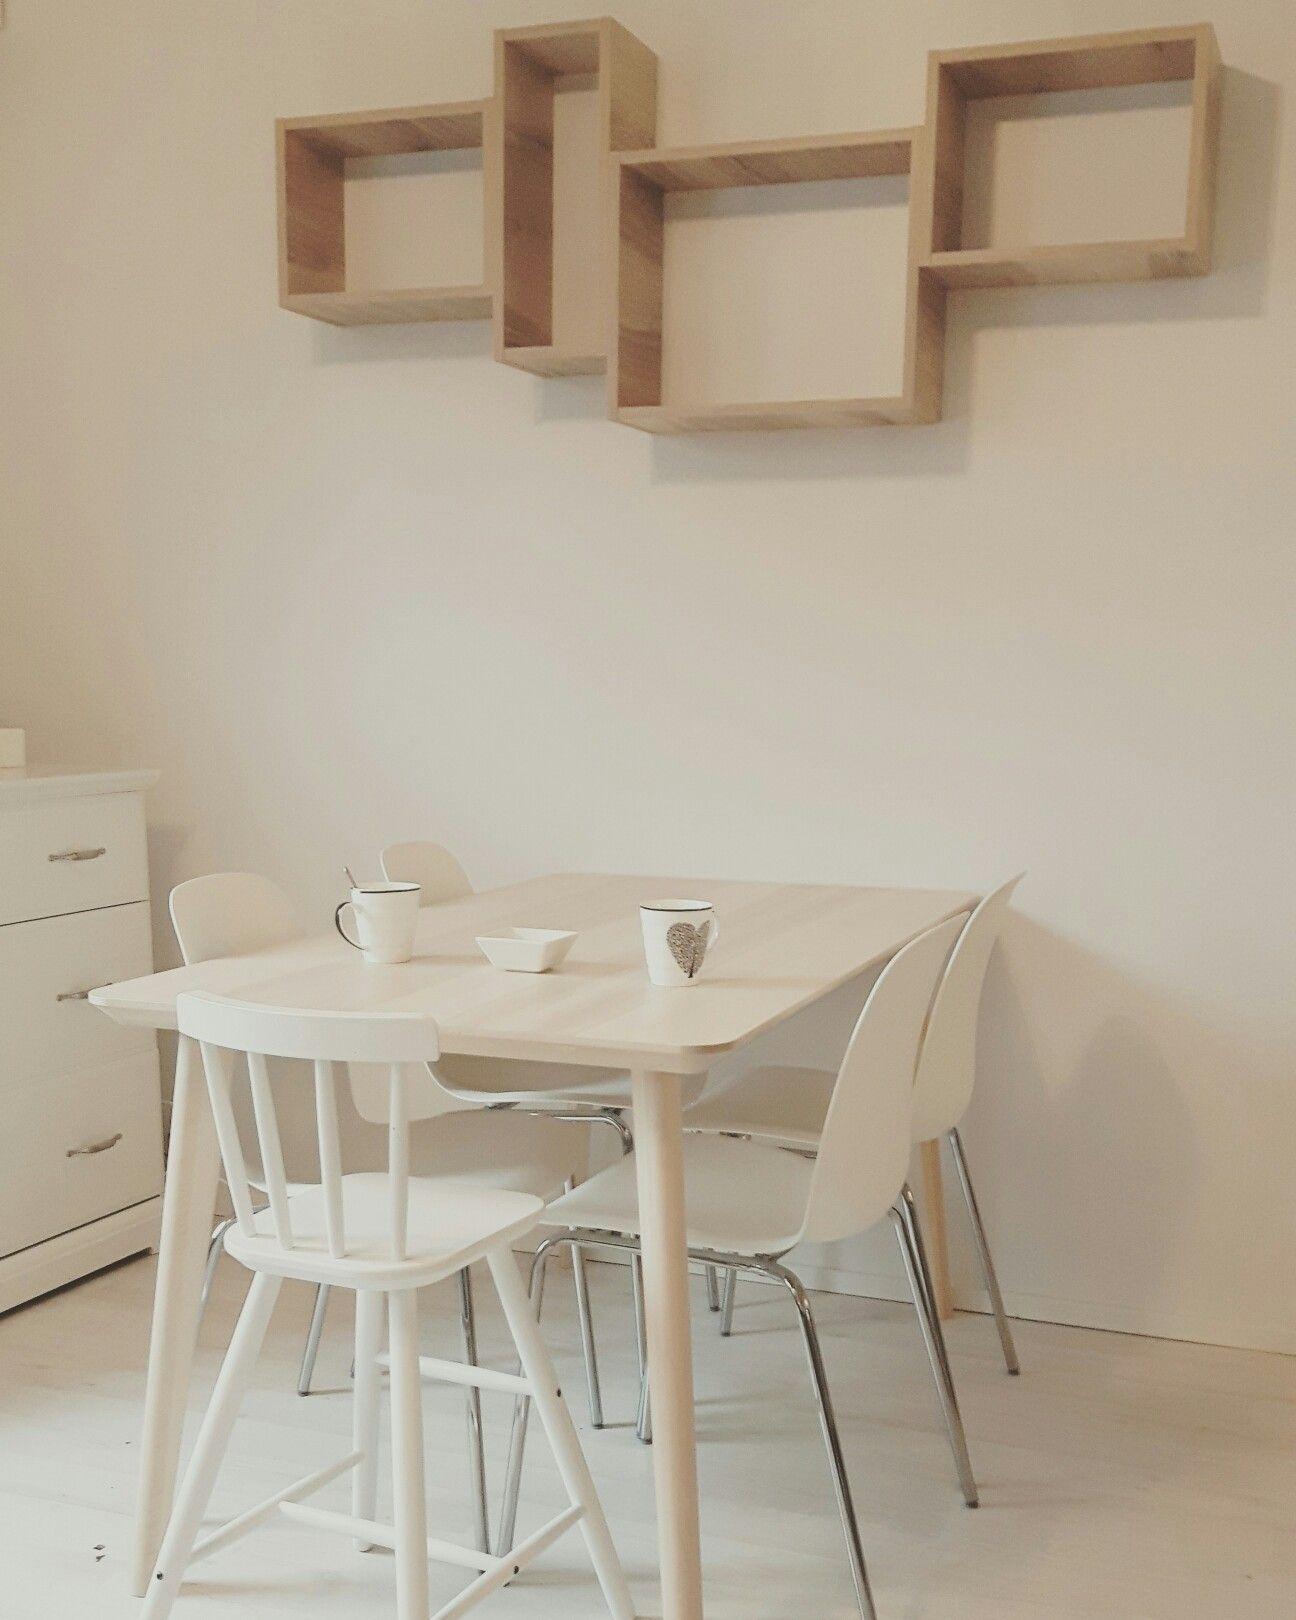 laatikkohyllyt futuro keitti t tilauksesta p yt ikea lisabo tuolit ikea wohnung. Black Bedroom Furniture Sets. Home Design Ideas